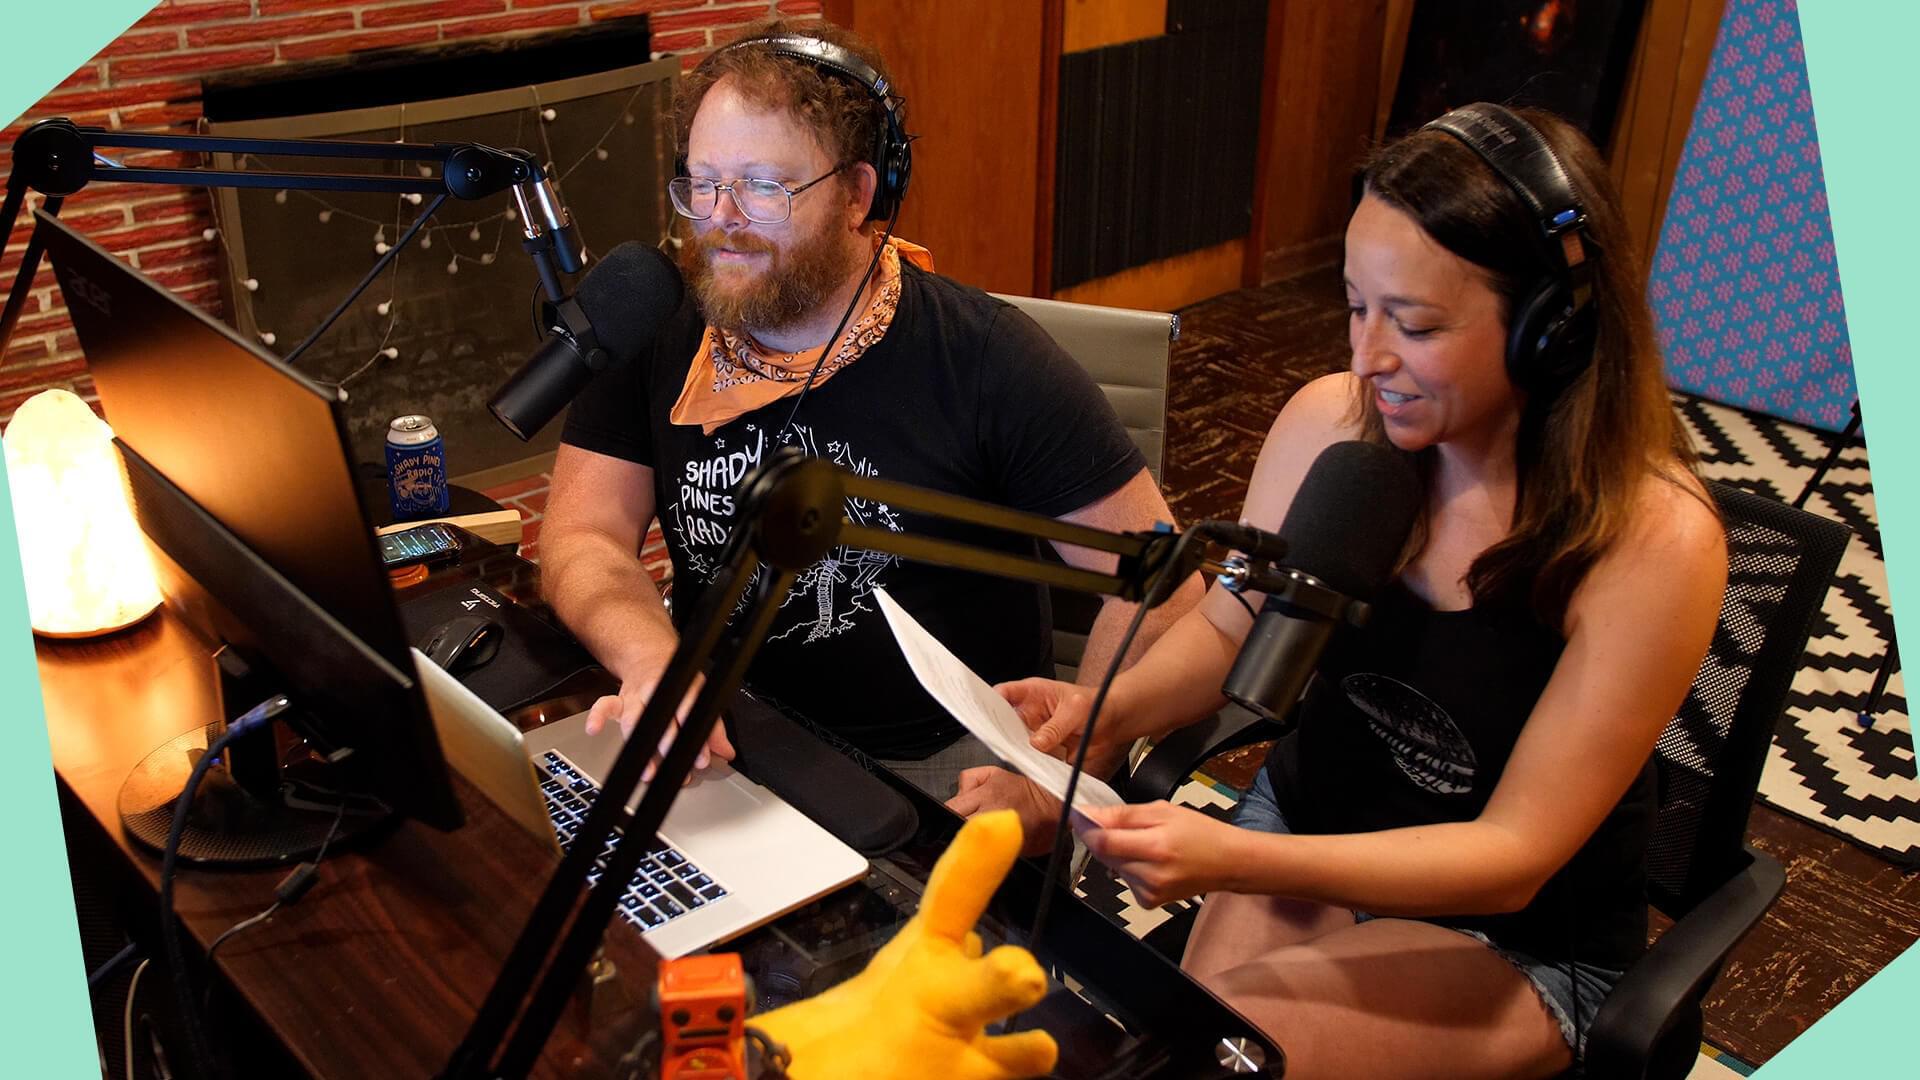 Shady pines radio creative community radio header